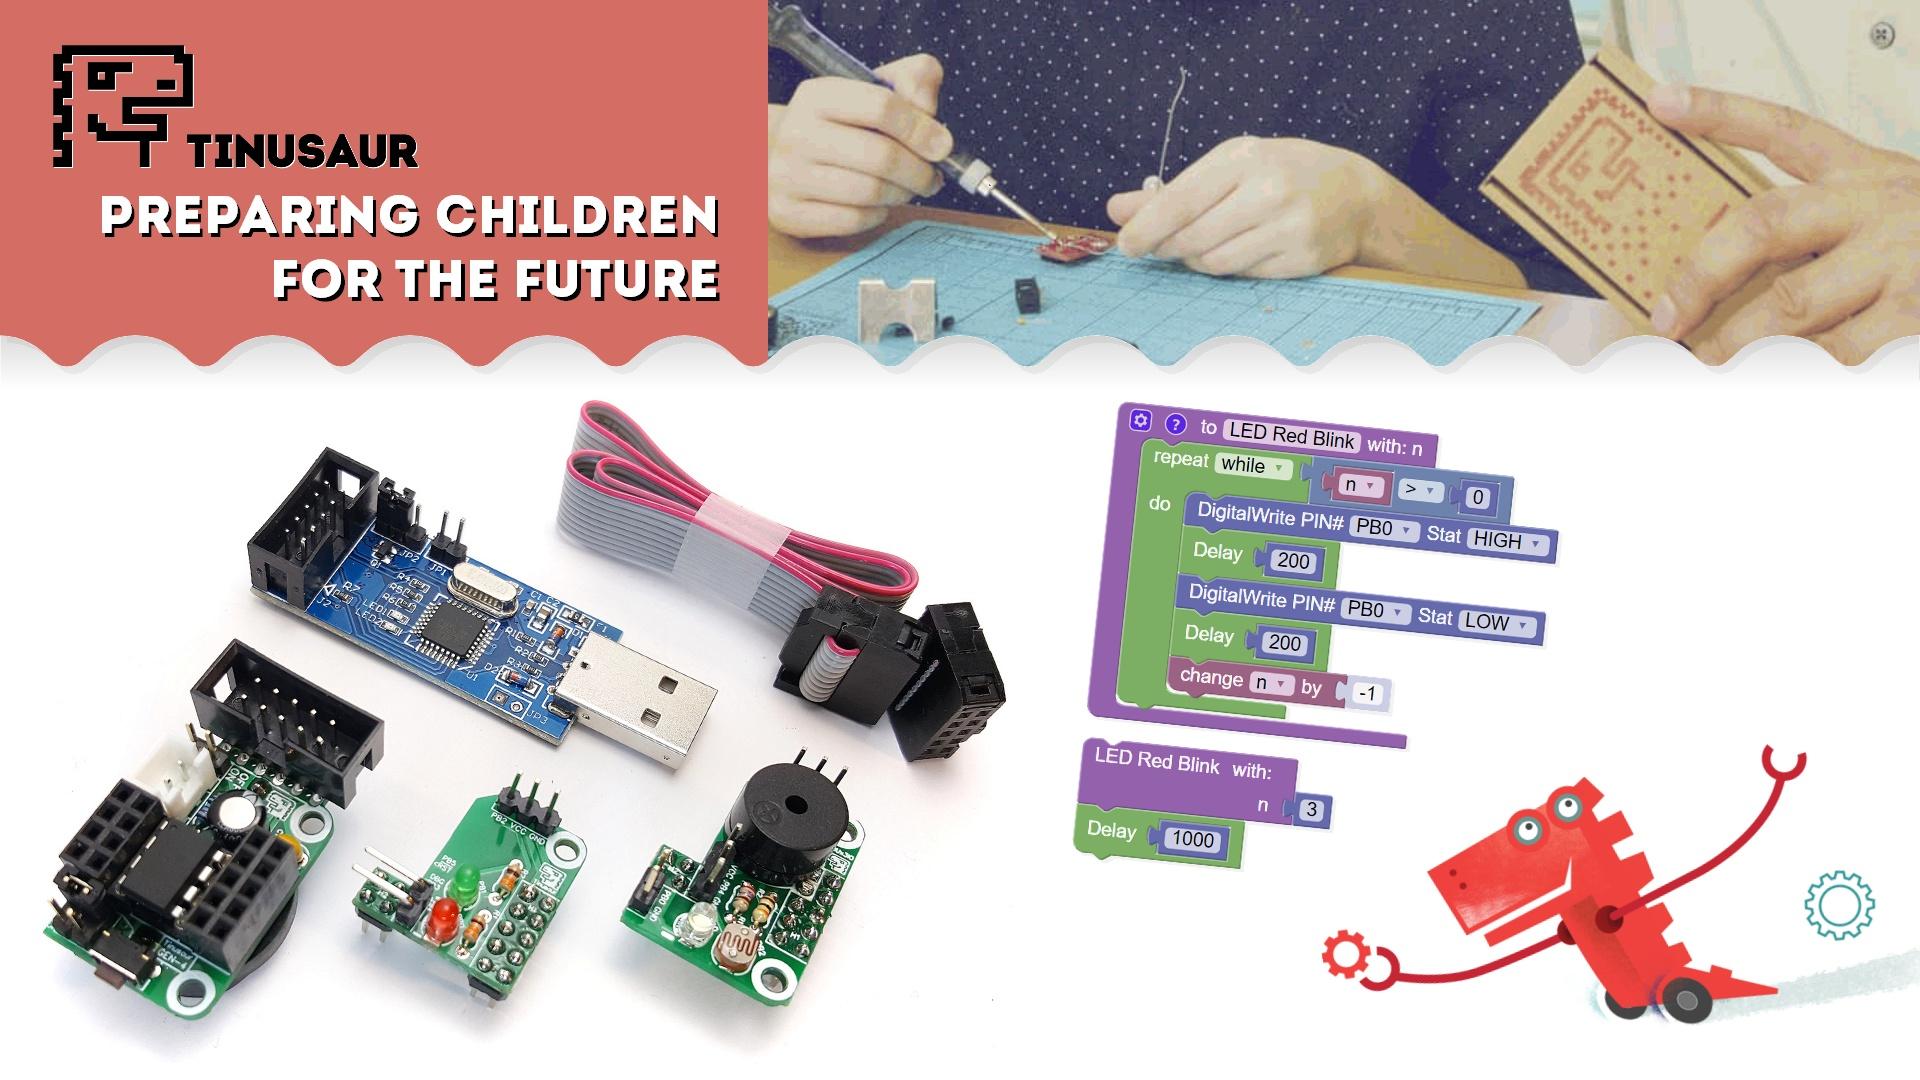 Tinusaur Products